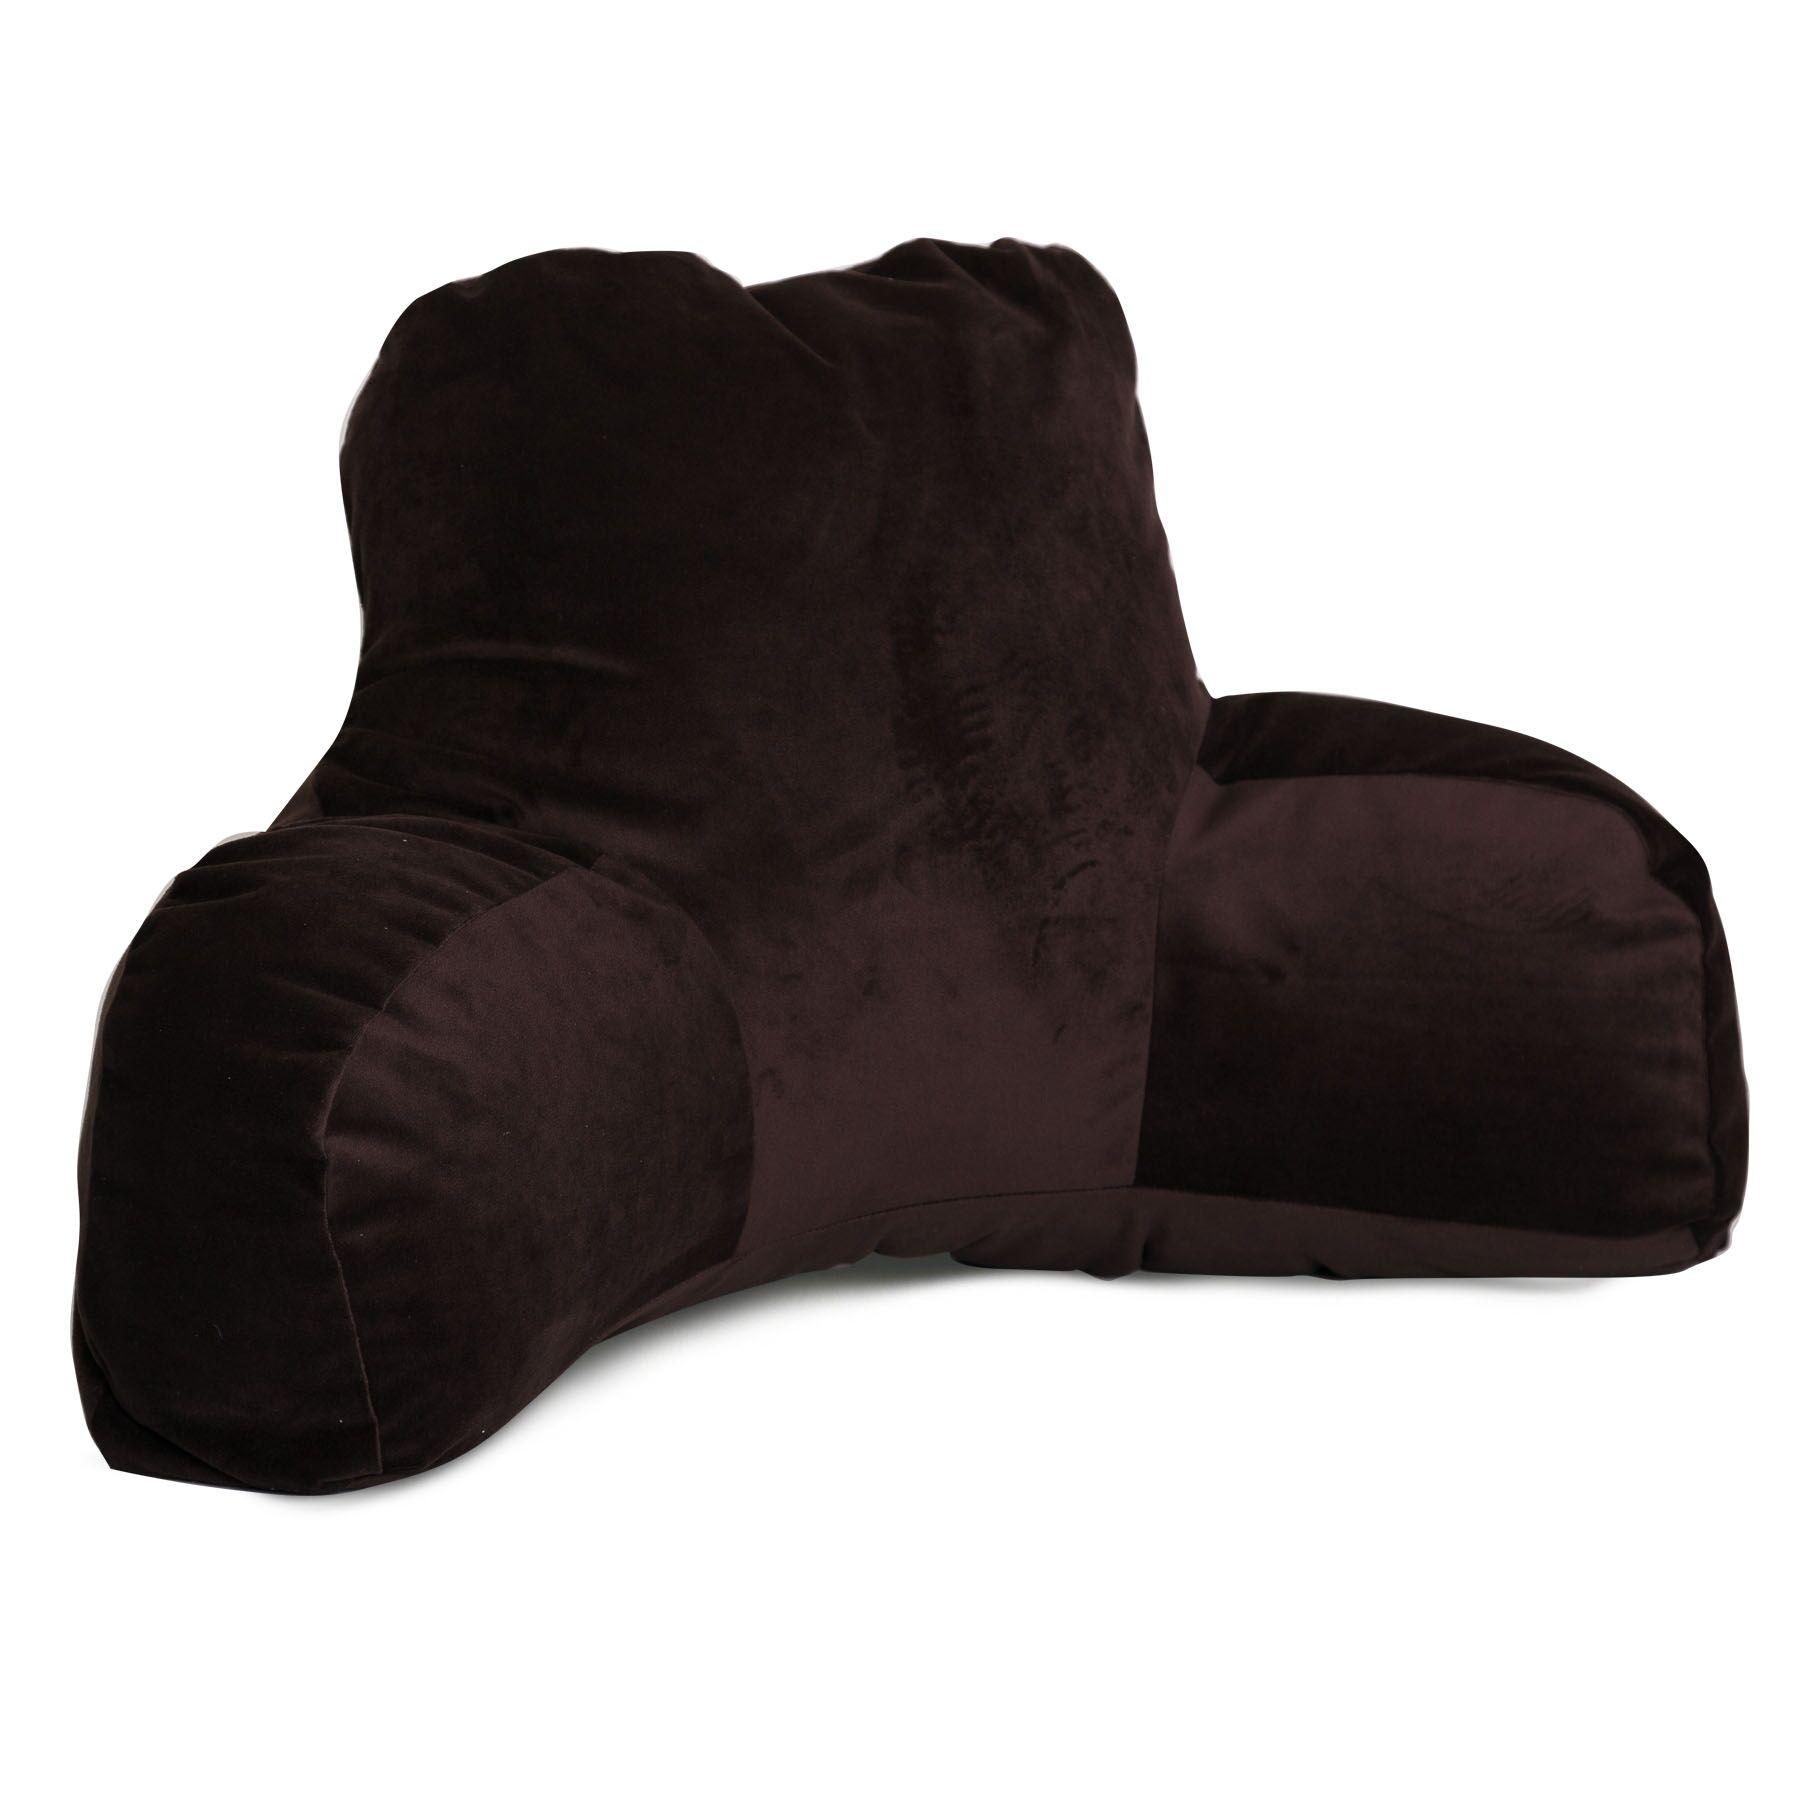 Bramma Reading Bed Rest Pillow Color: Dark Brown